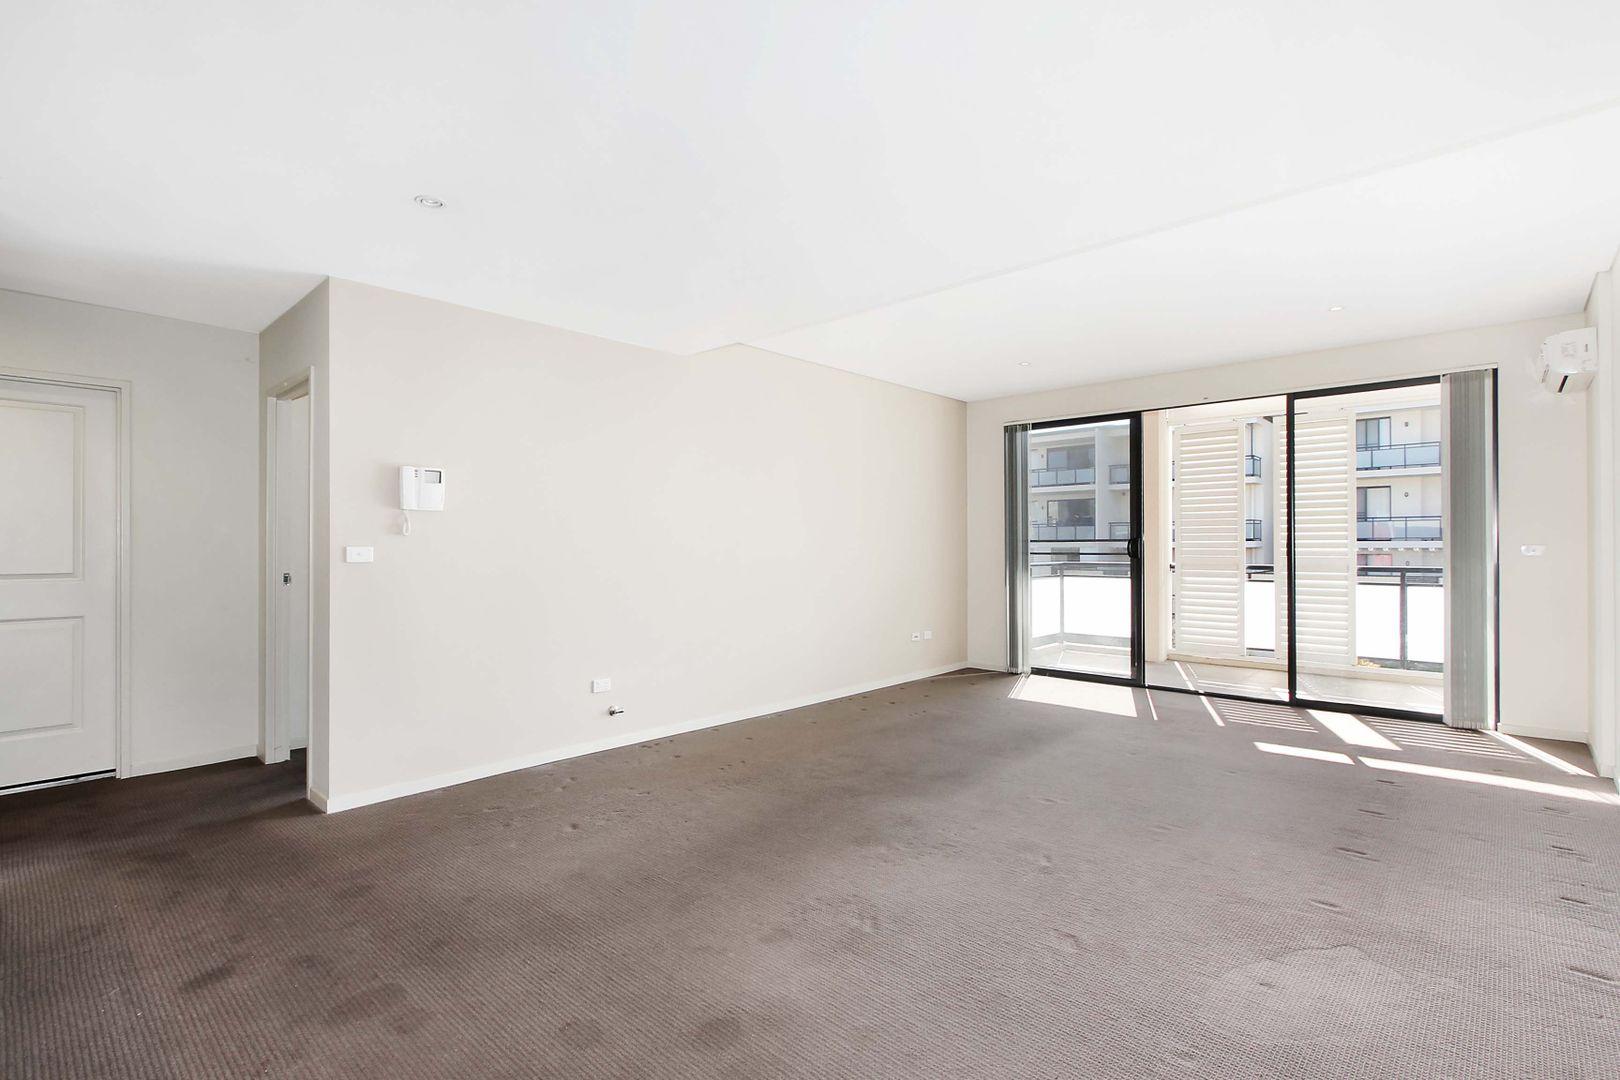 47/45-51 Balmoral Road, Northmead NSW 2152, Image 1